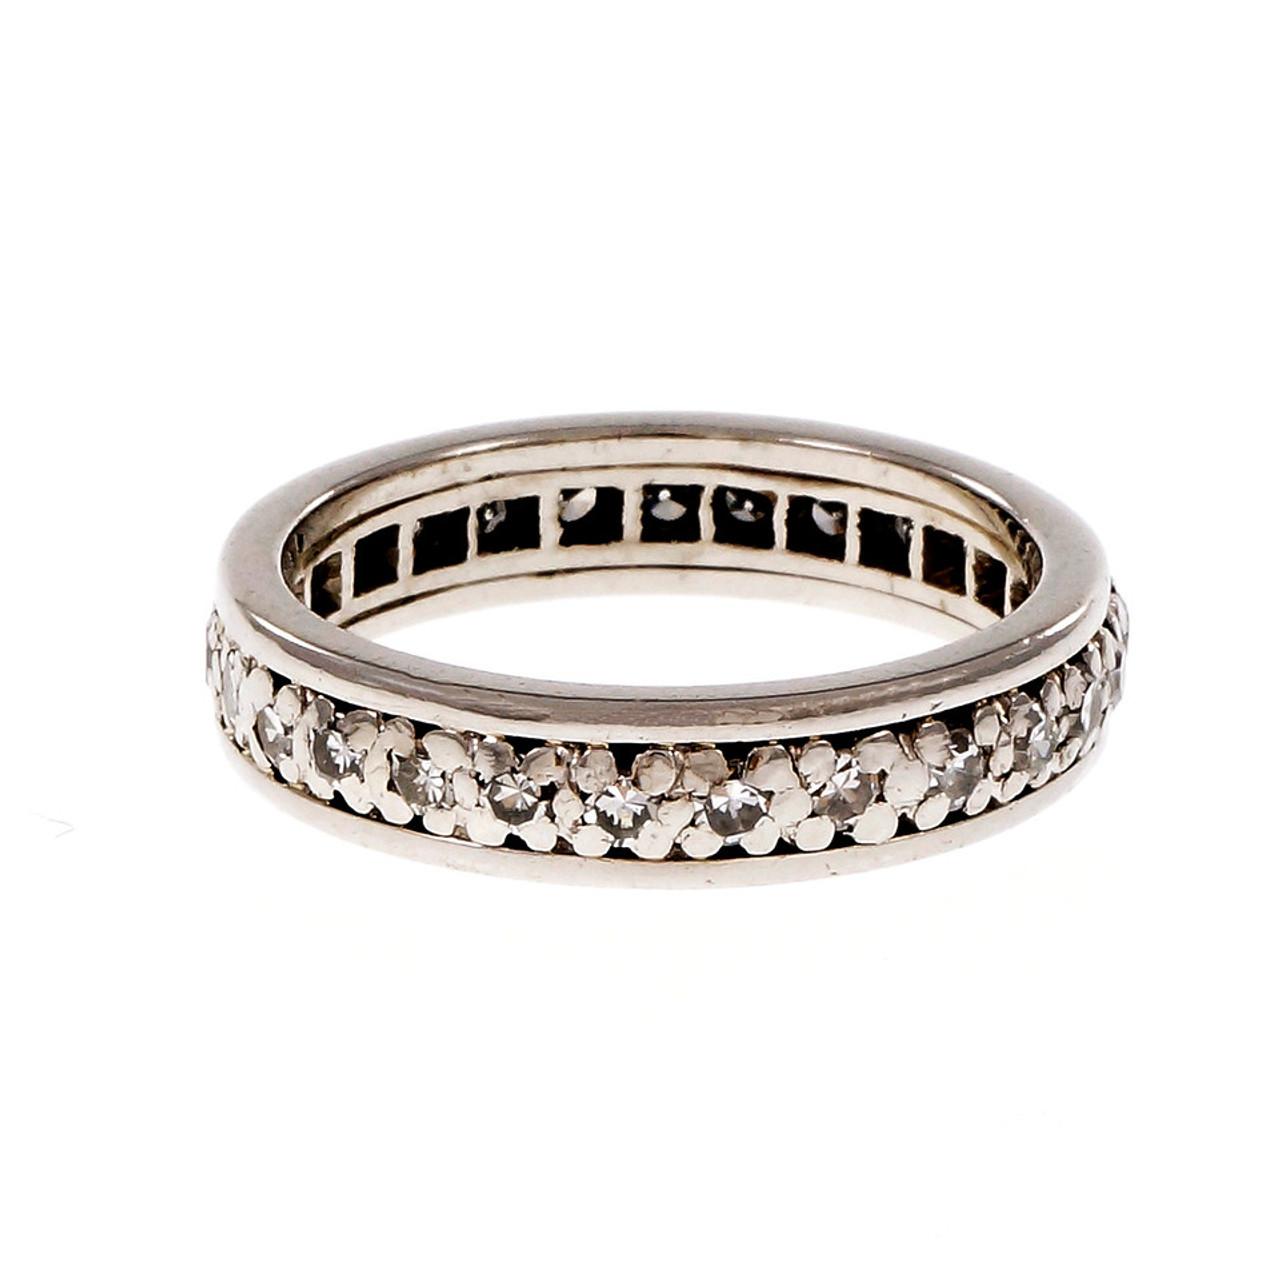 72fc53407006e Vintage 1940 Diamond Eternity Band Ring Platinum Size 7.5